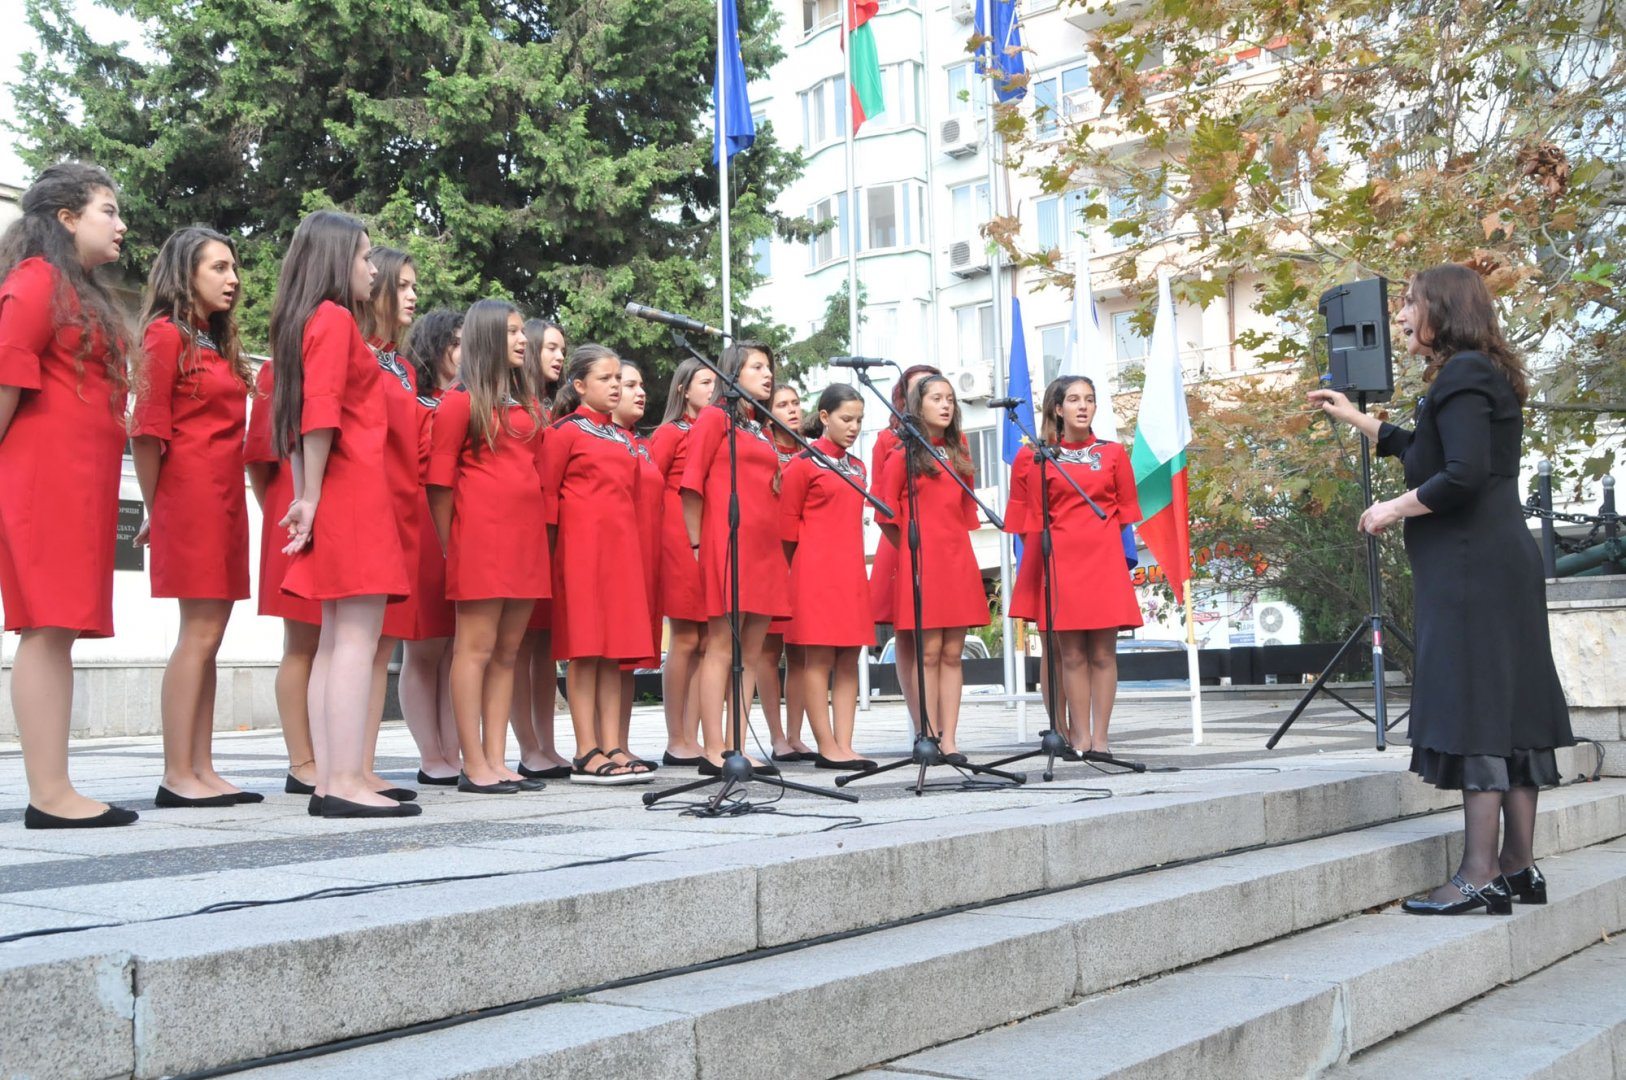 Хор Милка Стоева ще изнесе концерт на 21 ноември. Снимка Архив Черноморие-бг